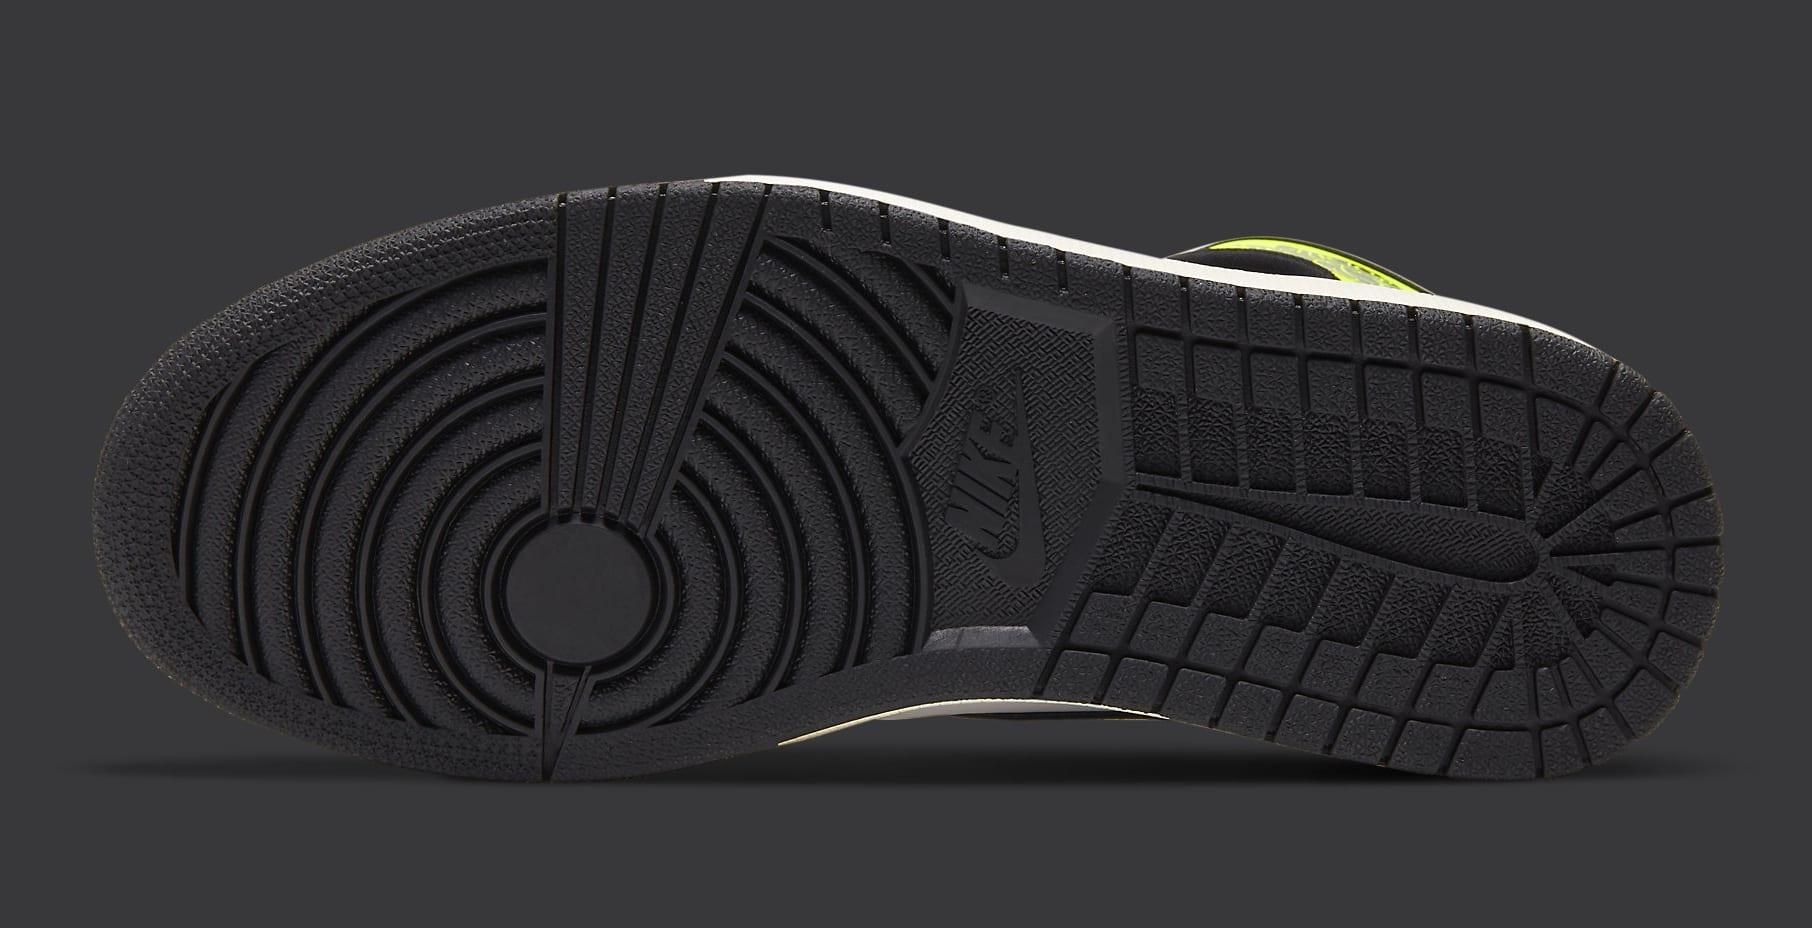 Air Jordan 1 Volt Gold Release Date 555088-118 Sole